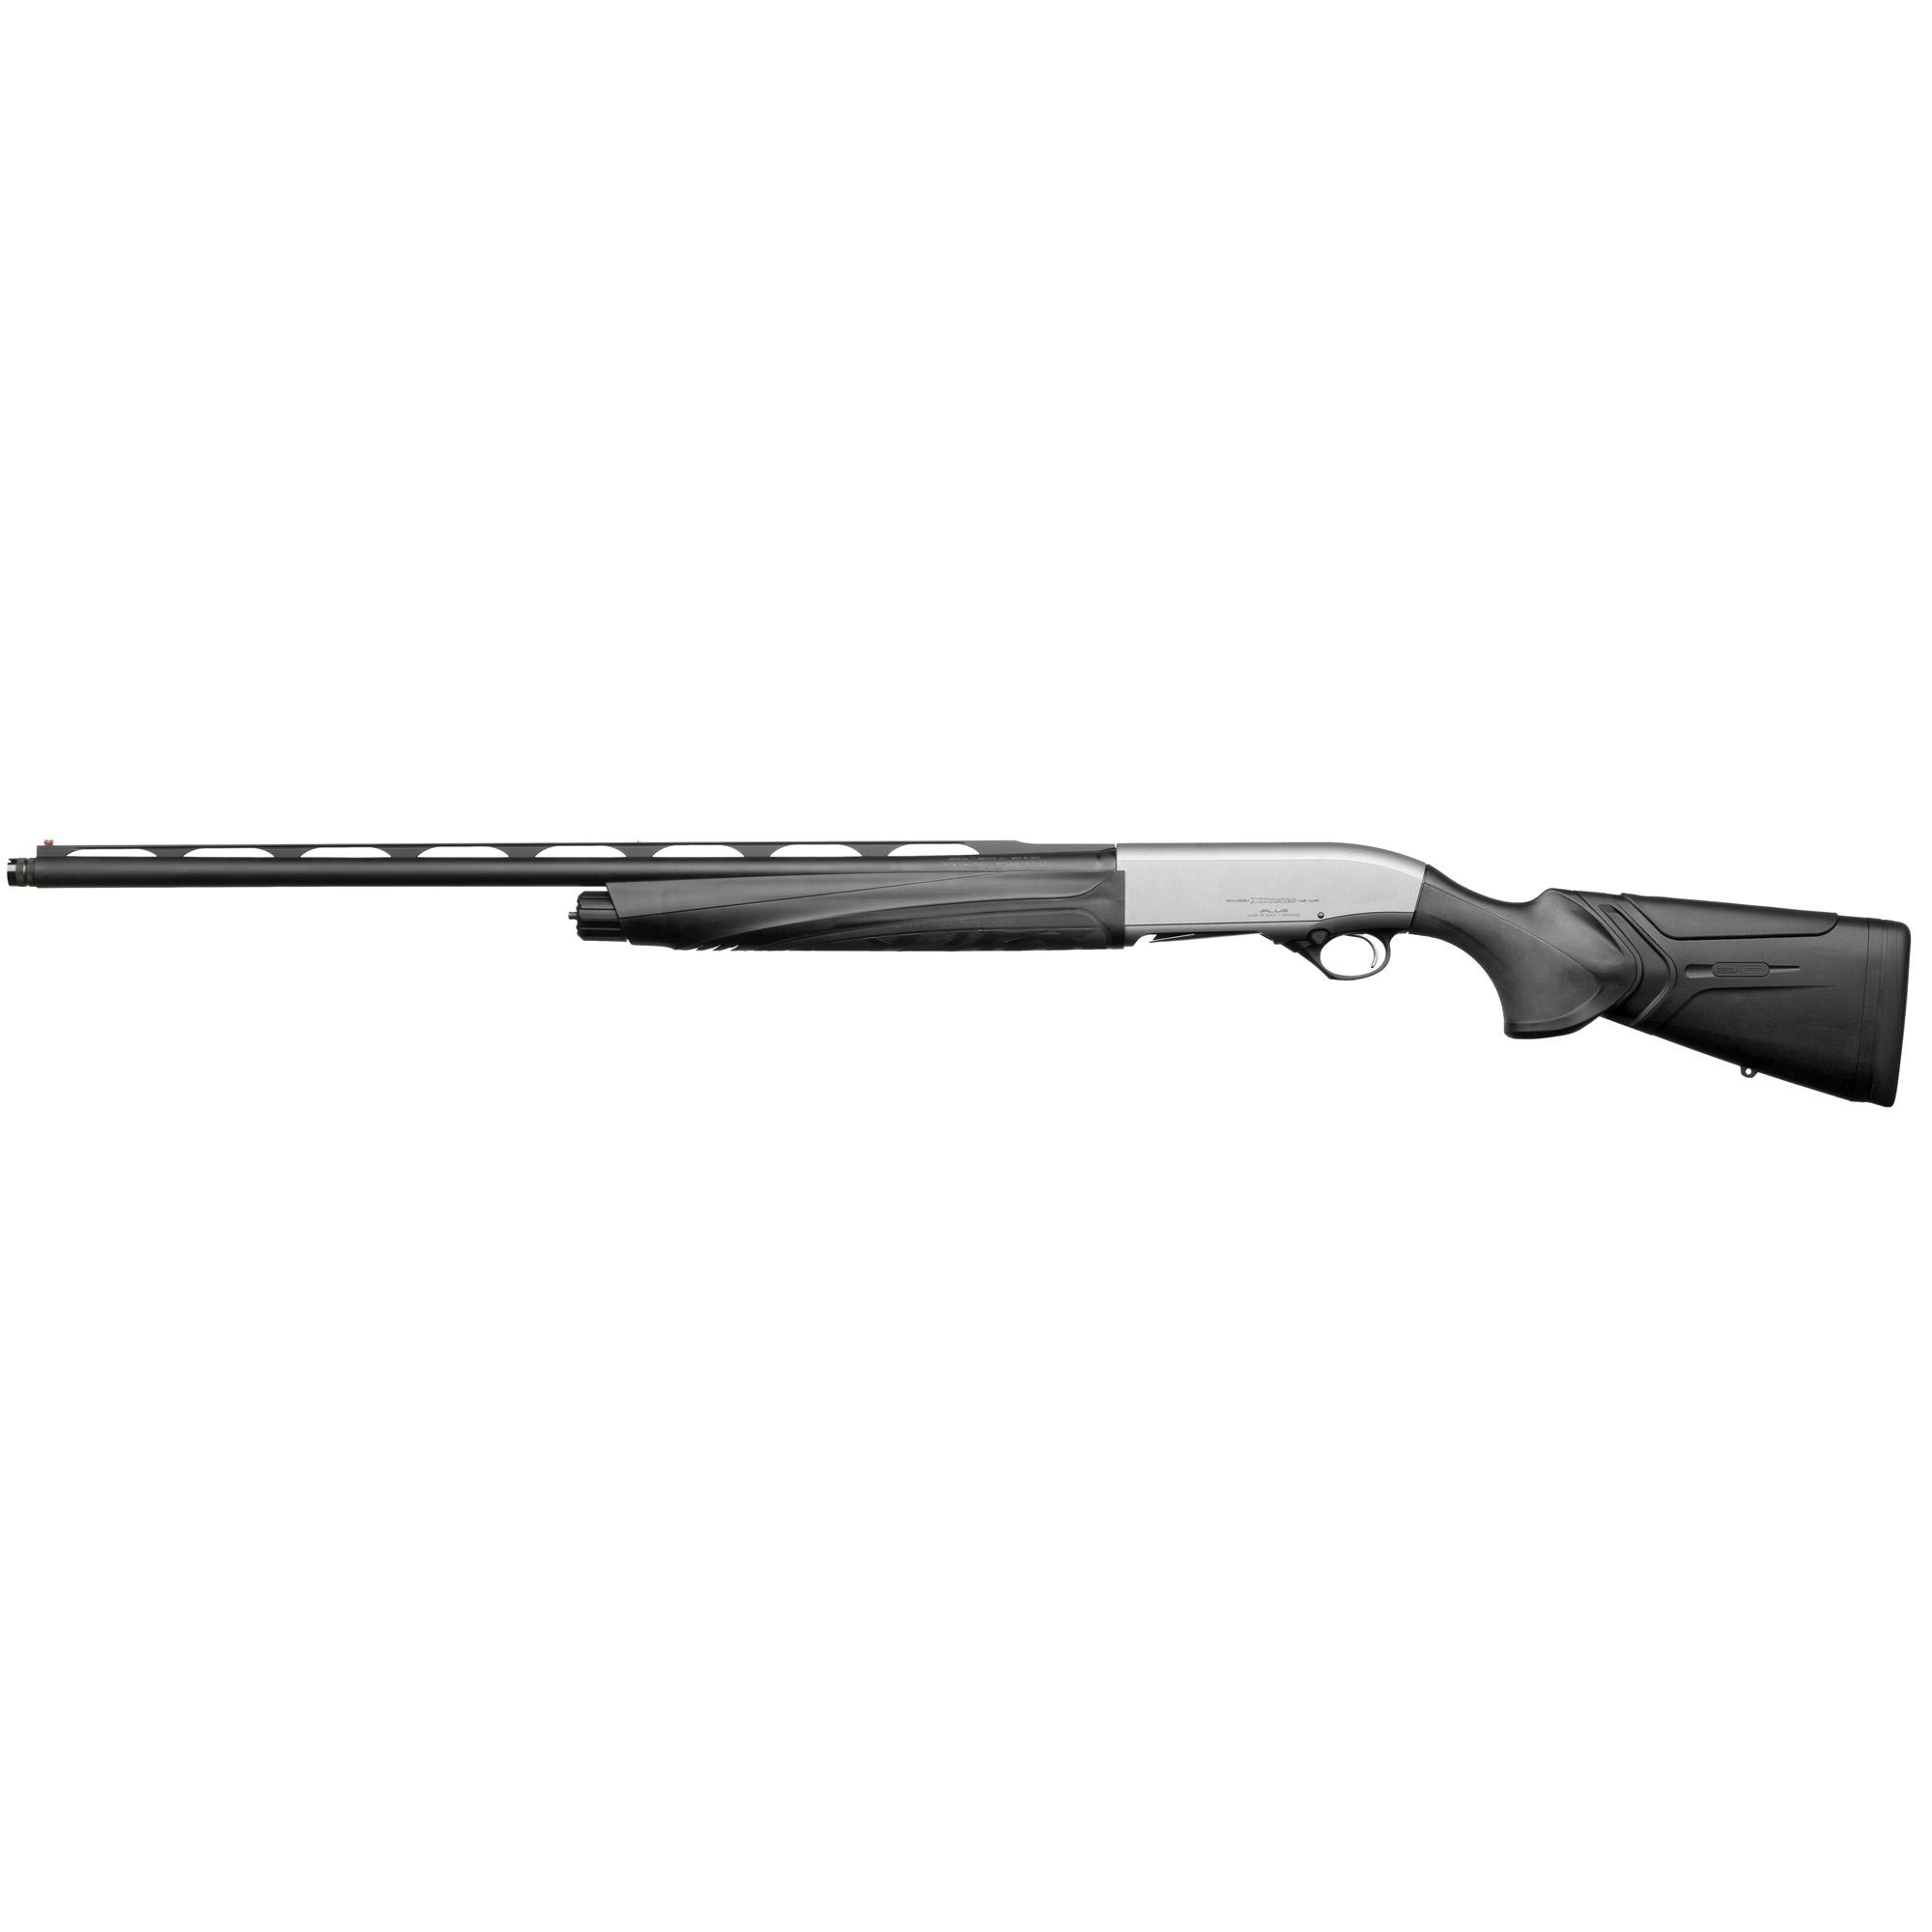 Beretta A400 Xtreme Ko 12/30 Blk